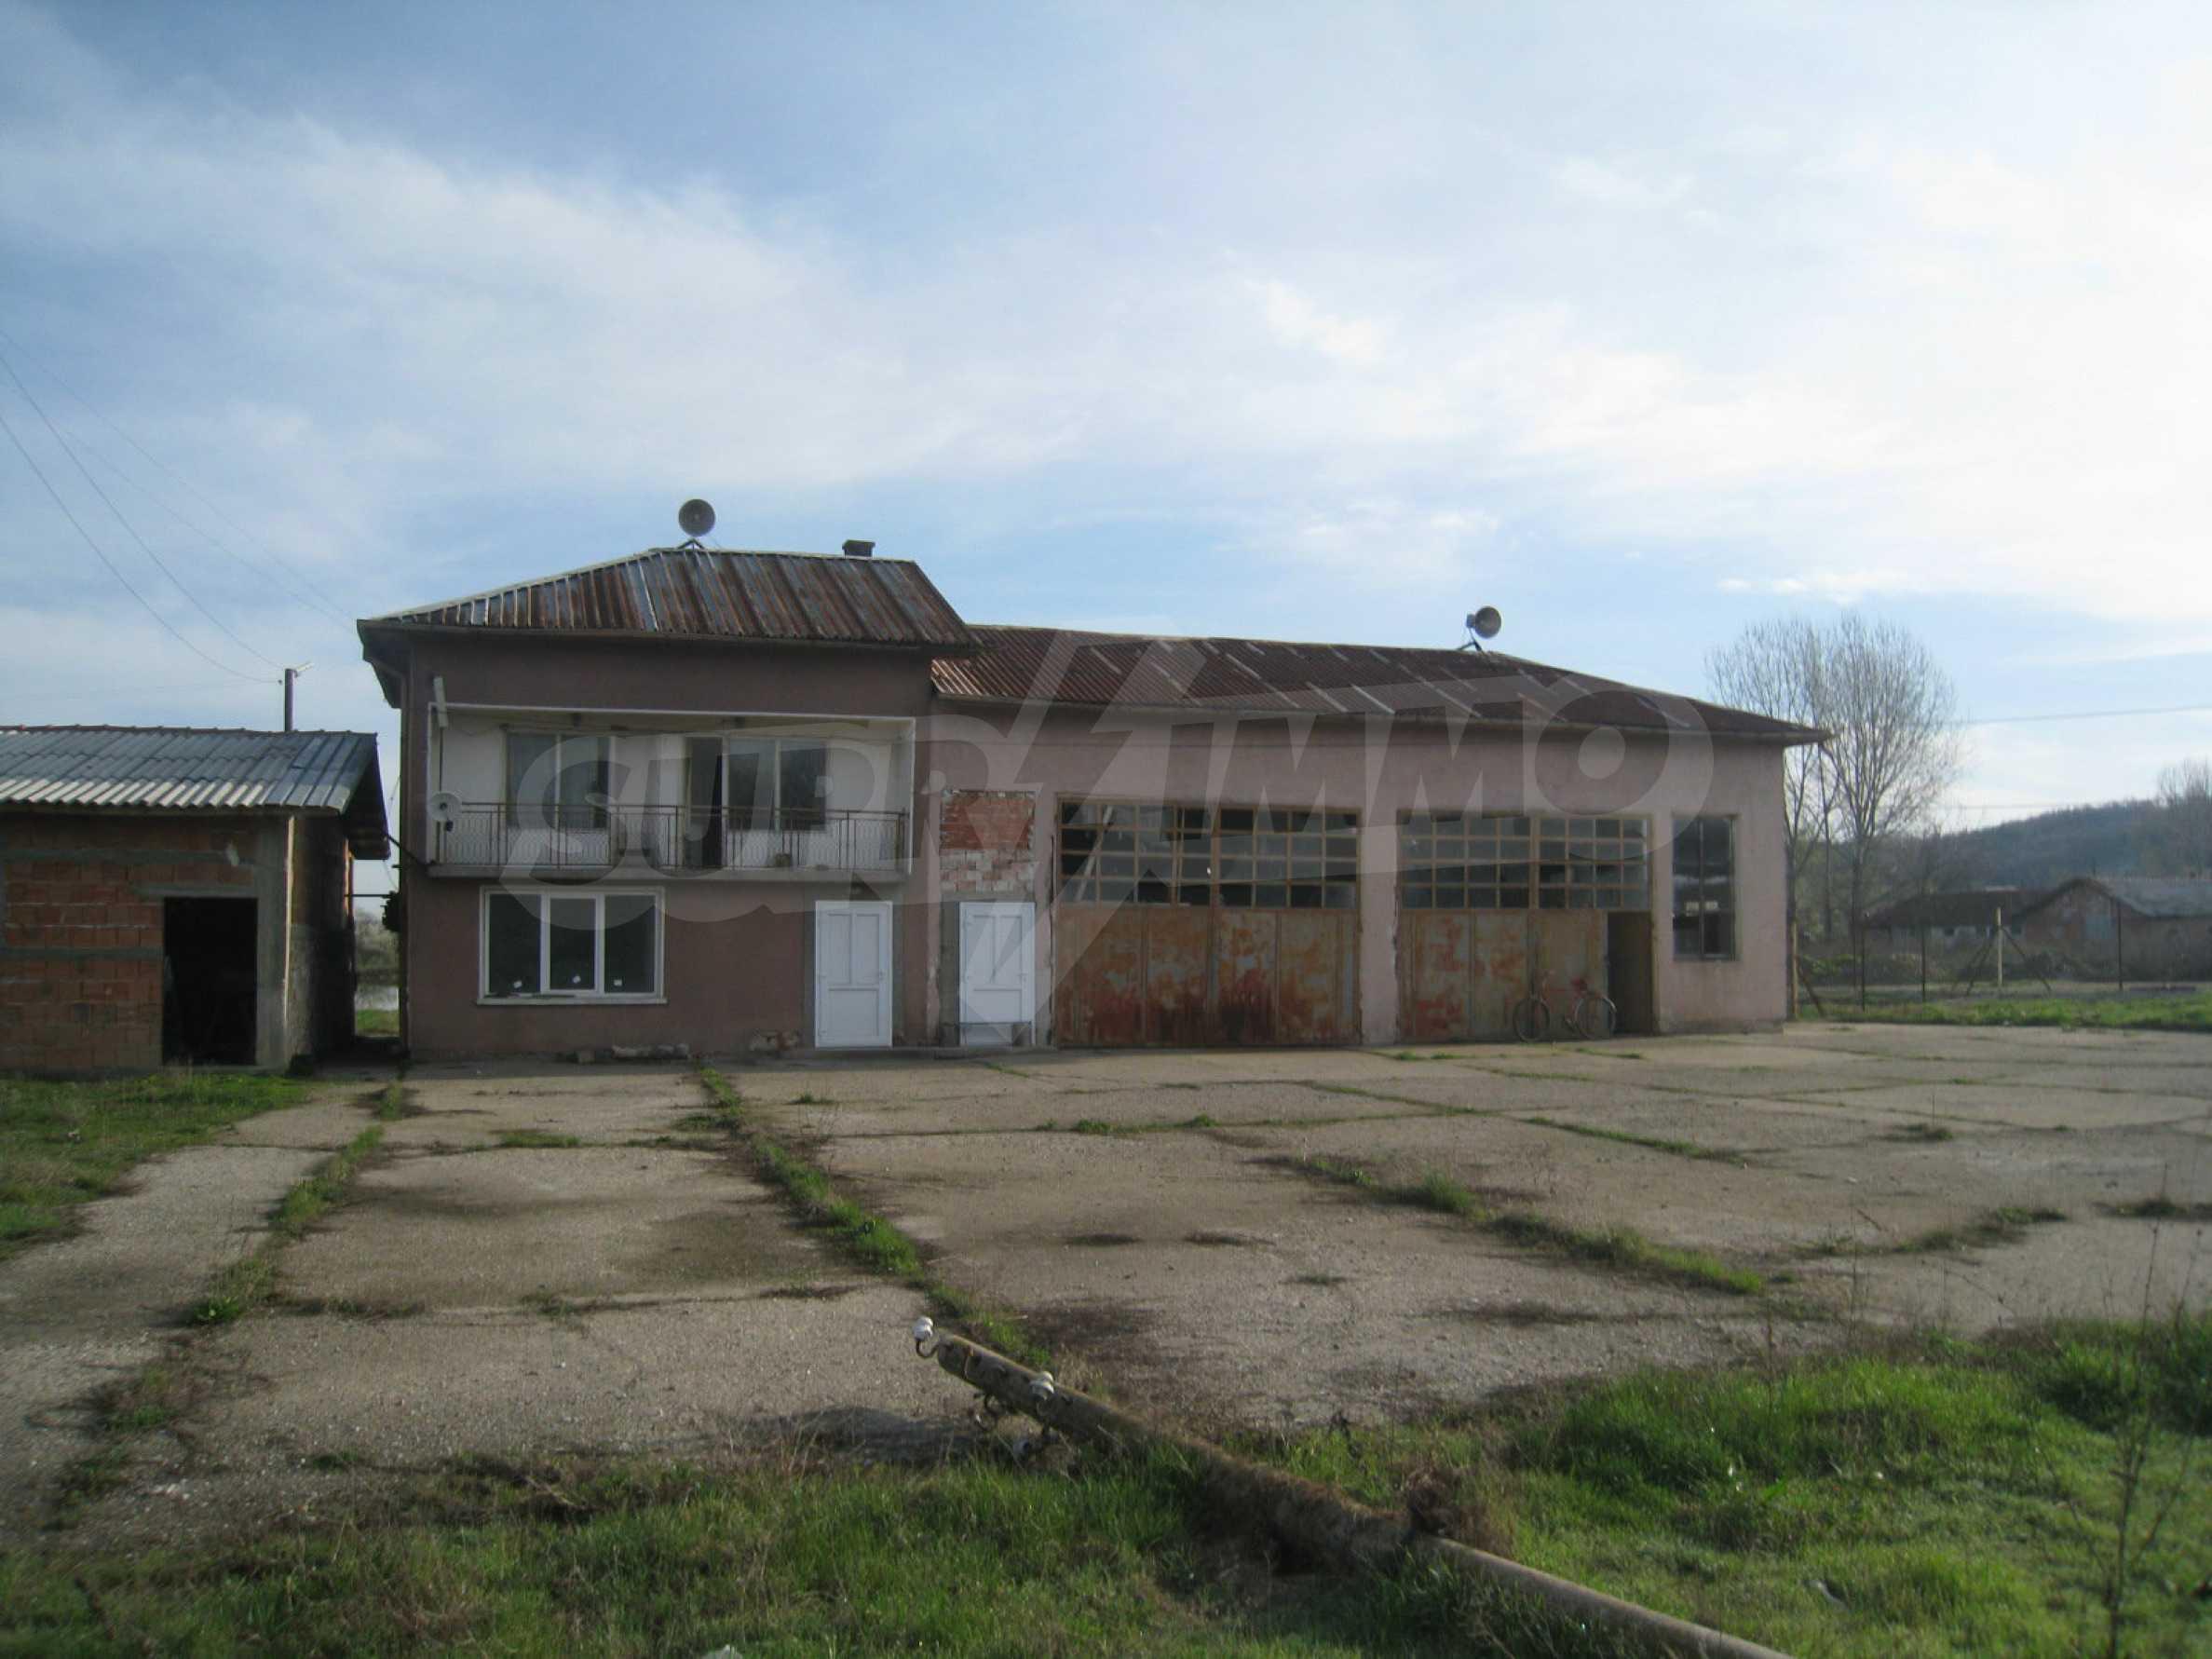 Fishpond, warehouses, residential areas and asphalt ground near Montana 10